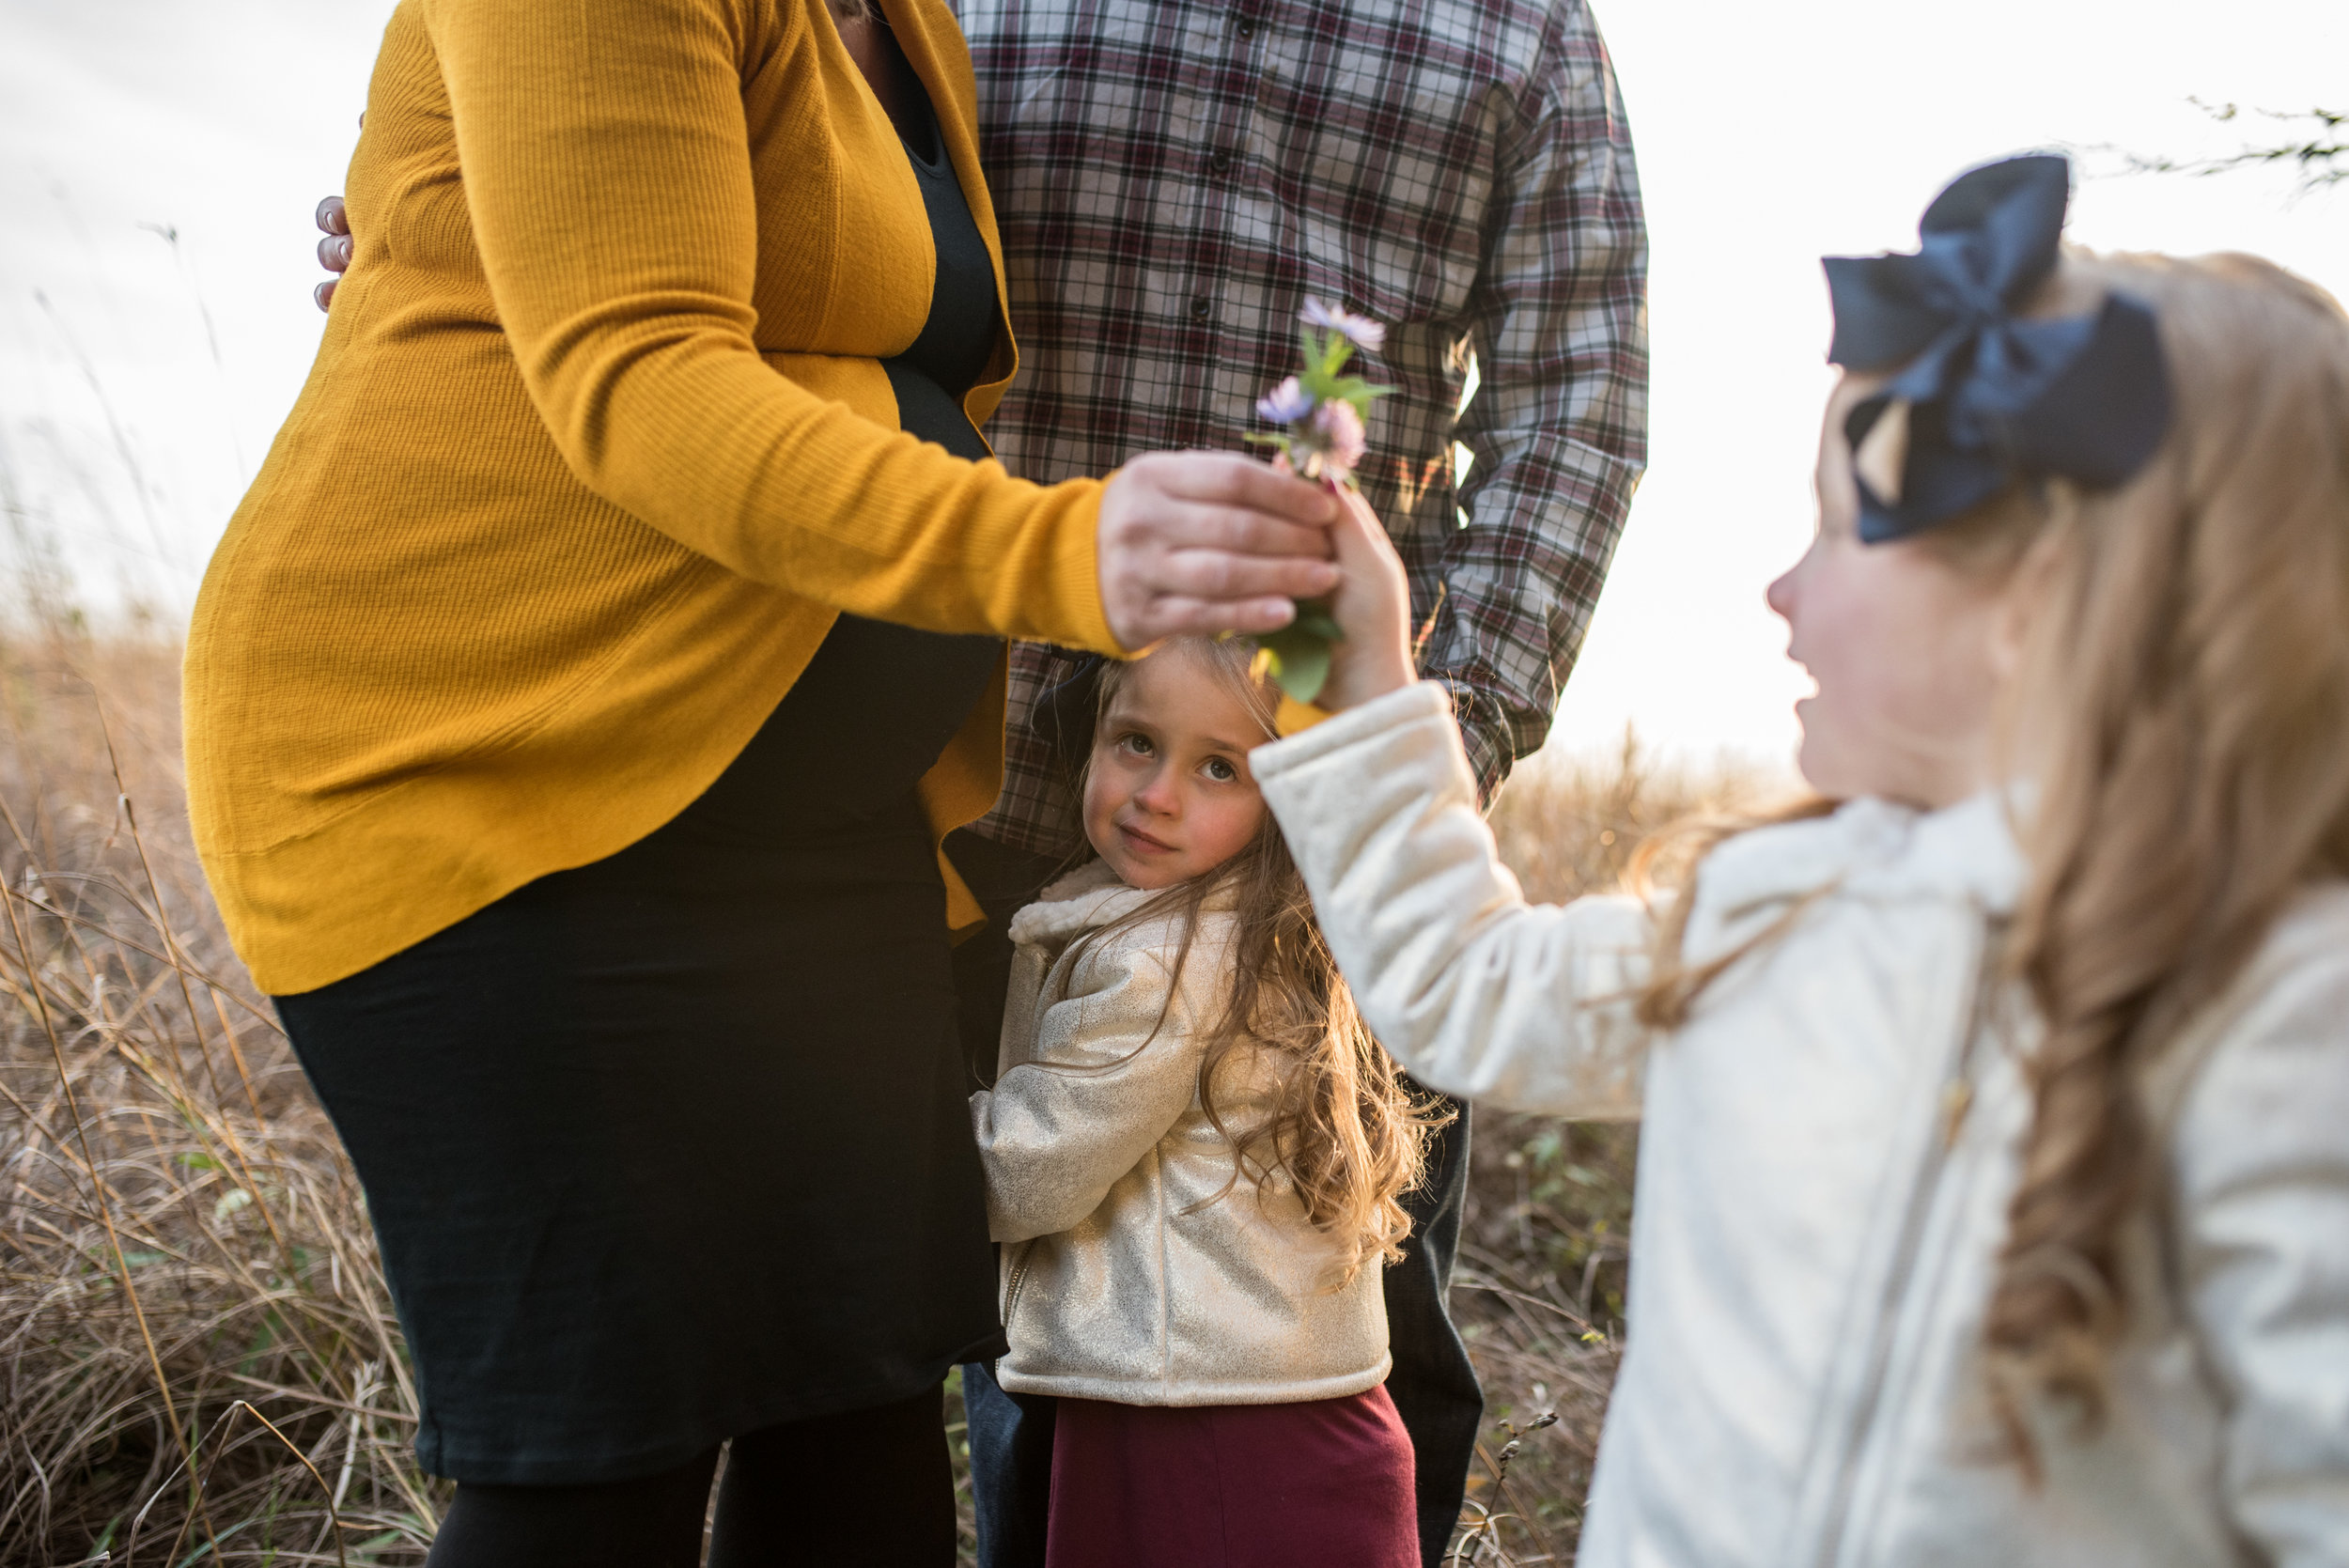 Daughter hugging moms legs, another daughter handing wildflowers to mom